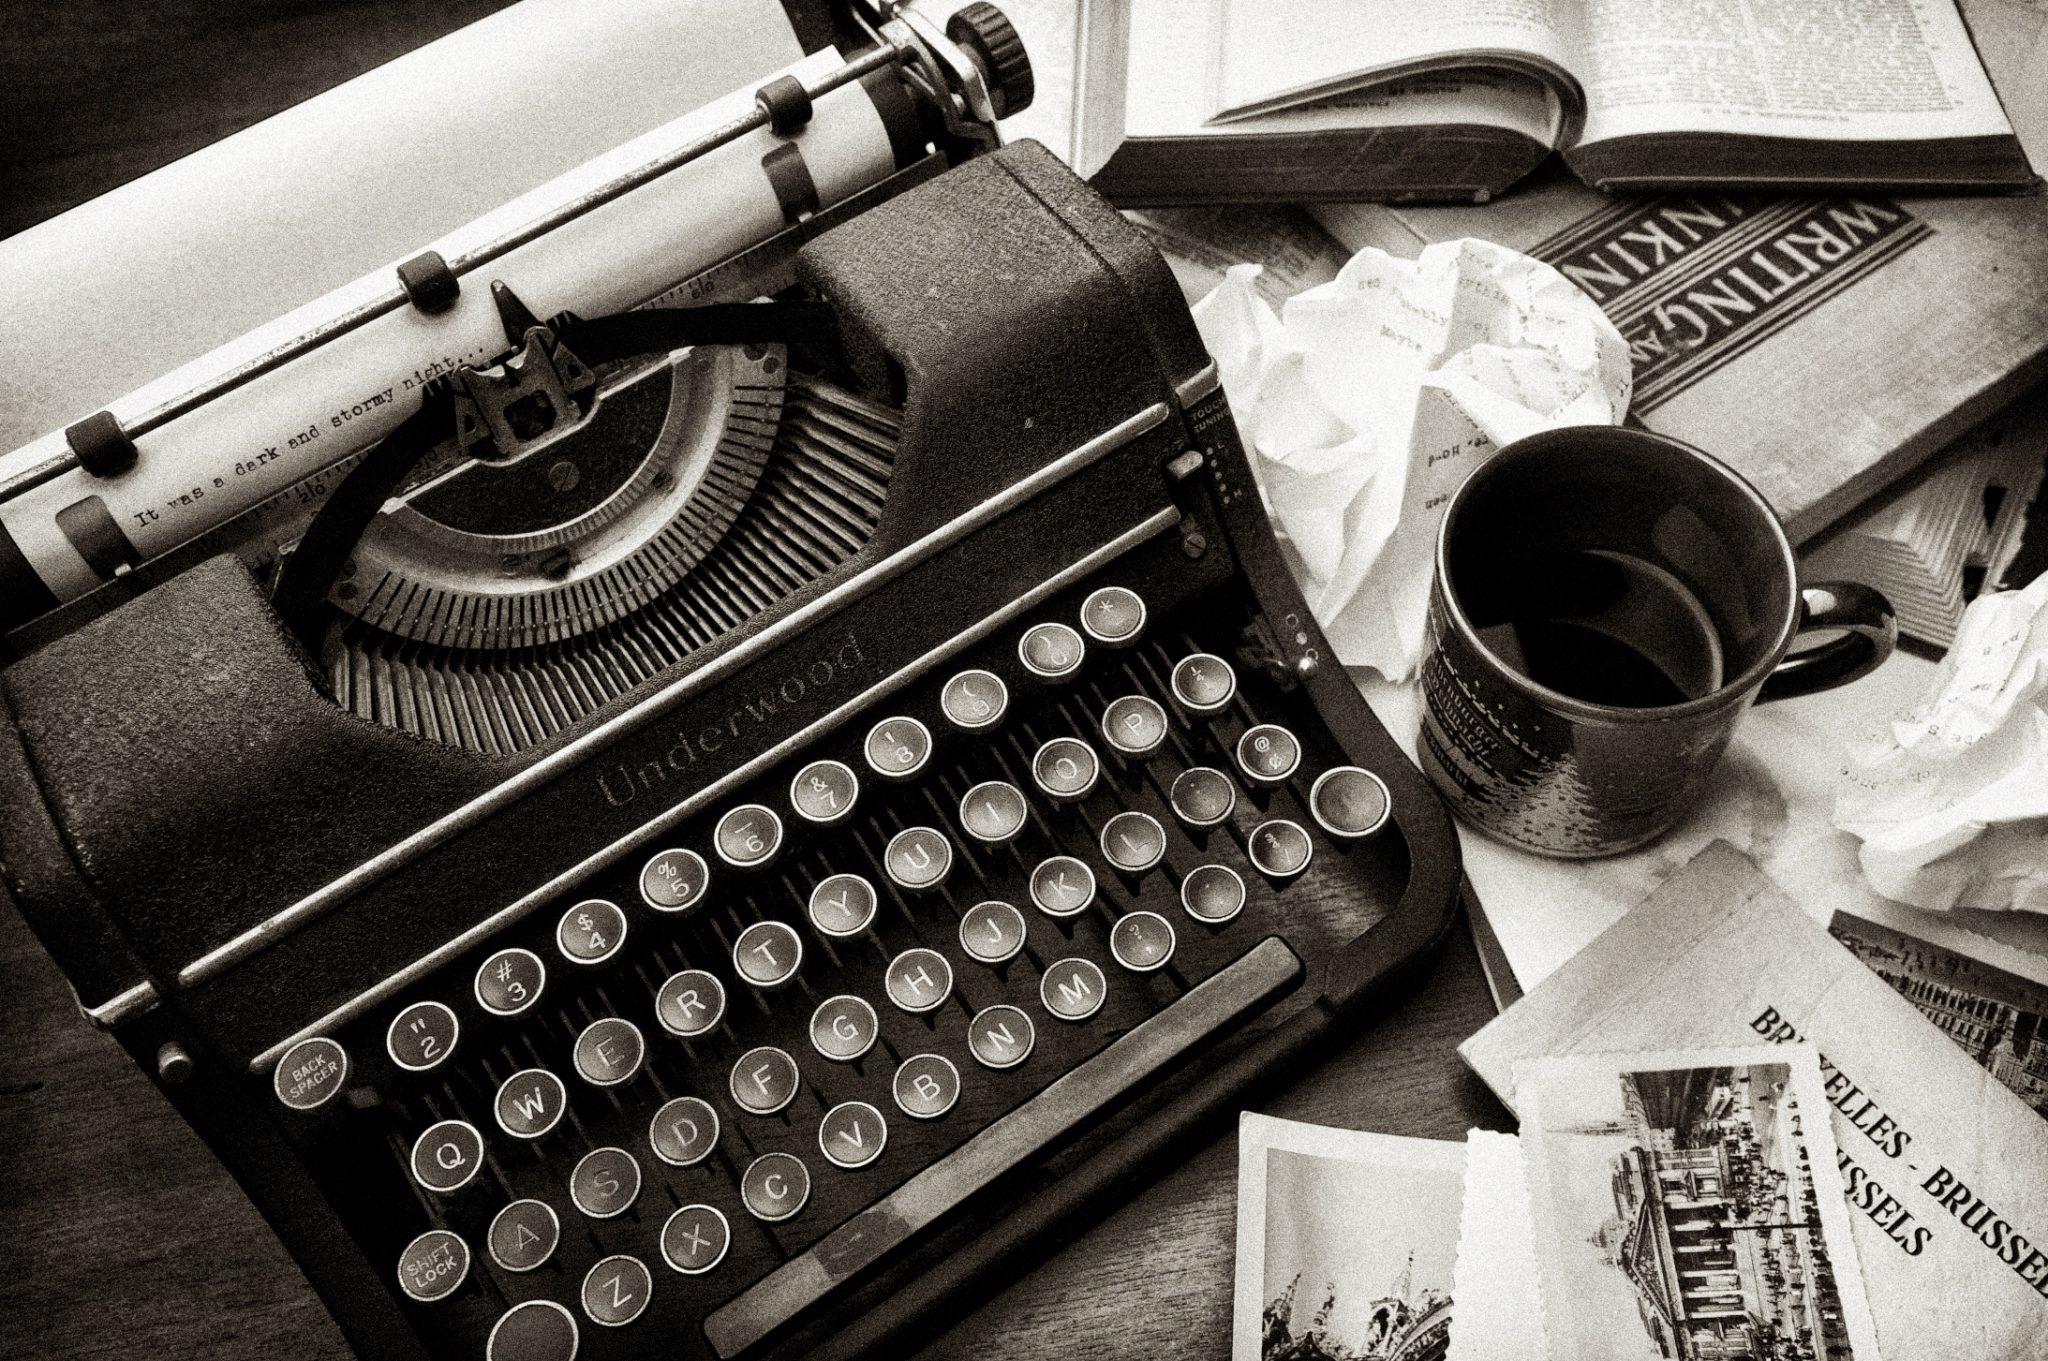 - Write